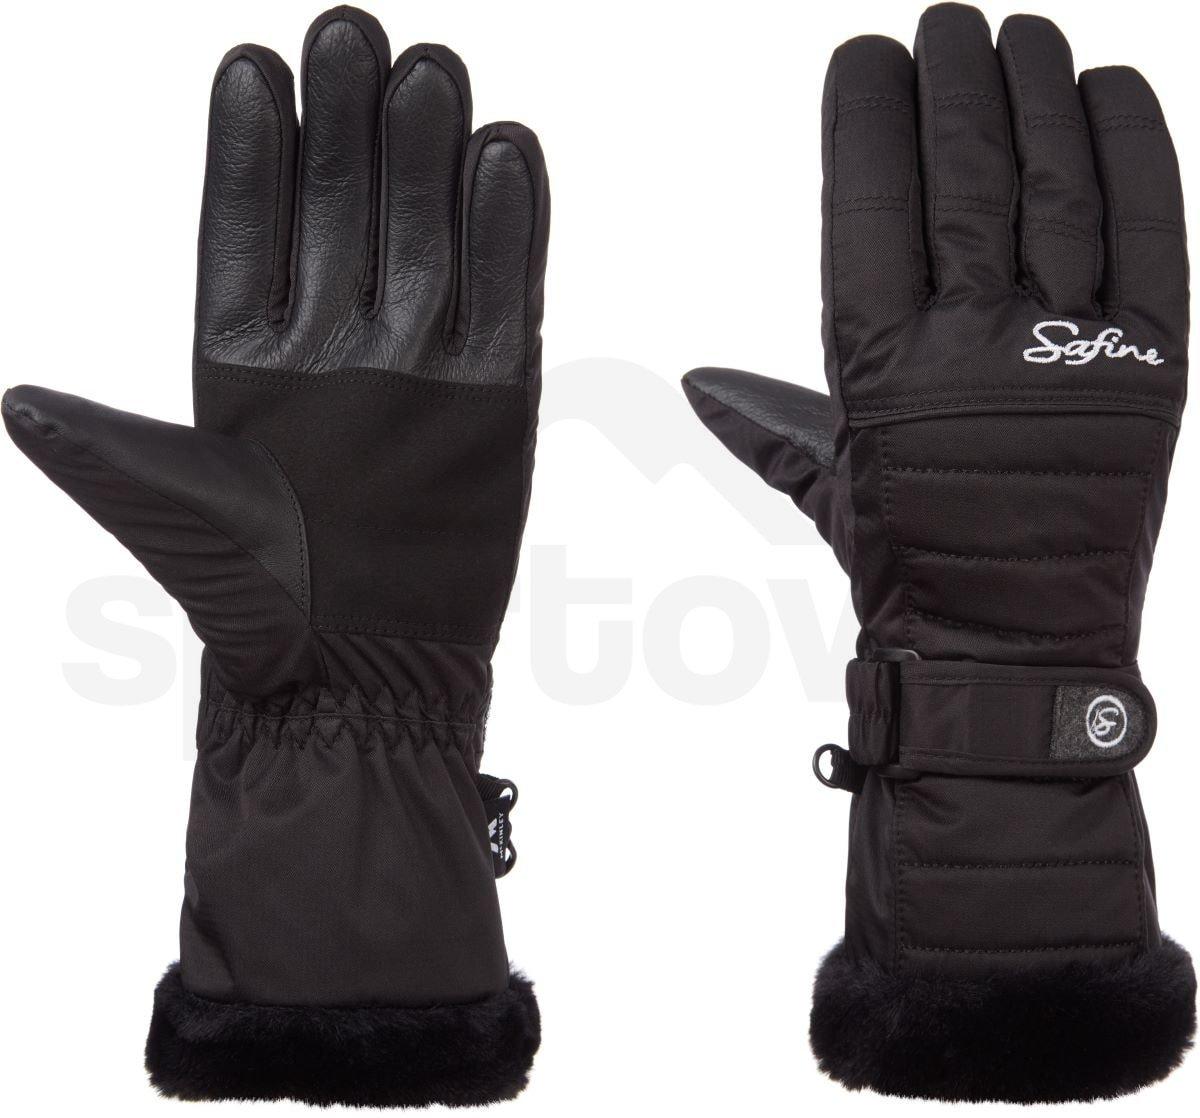 408122-057 mck rukavice safine (1)-min